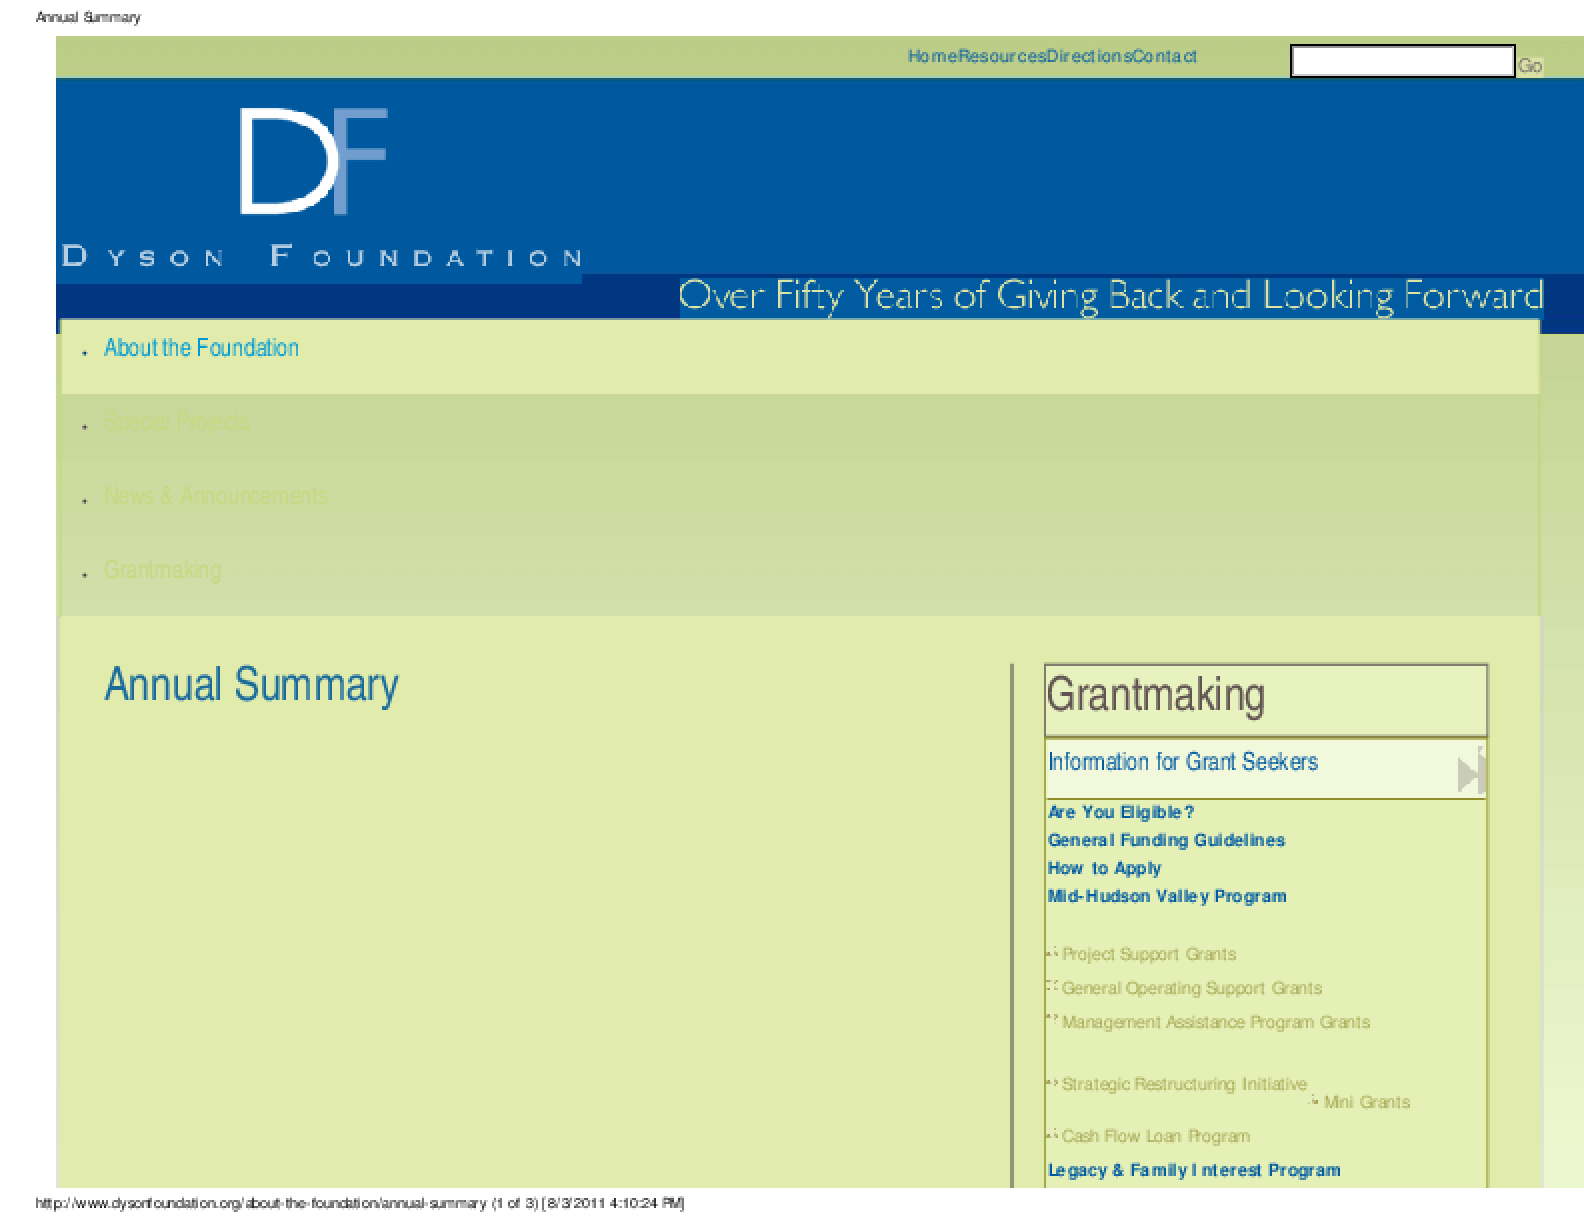 Dyson Foundation 2010 Annual Report